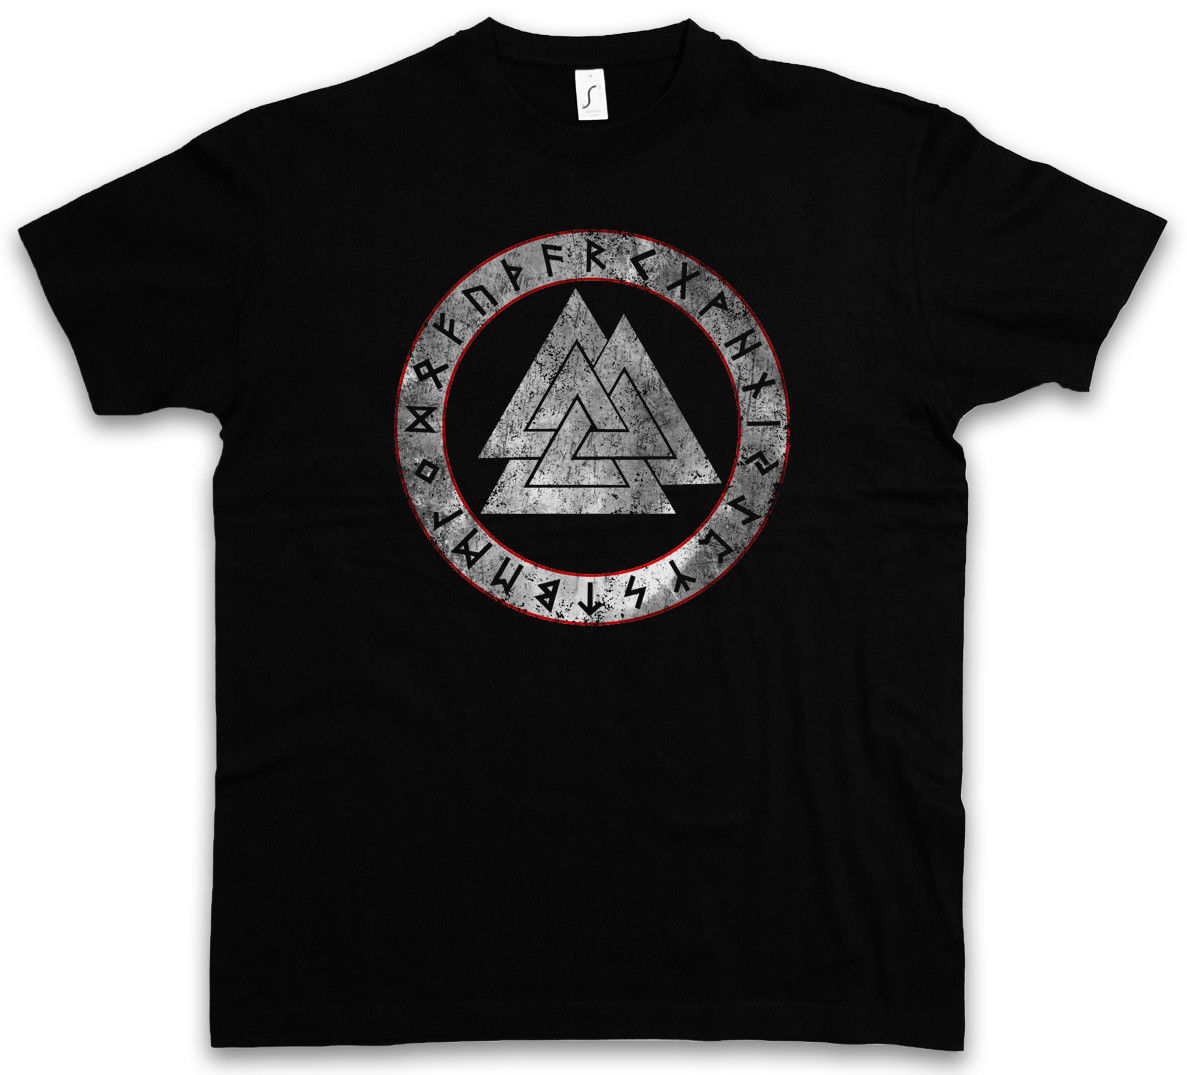 2018 Fashion Short Tee Valknut Runes T Shirt Paganism Newpaganism Odin Thor Loki Midgard Rune Walhalla